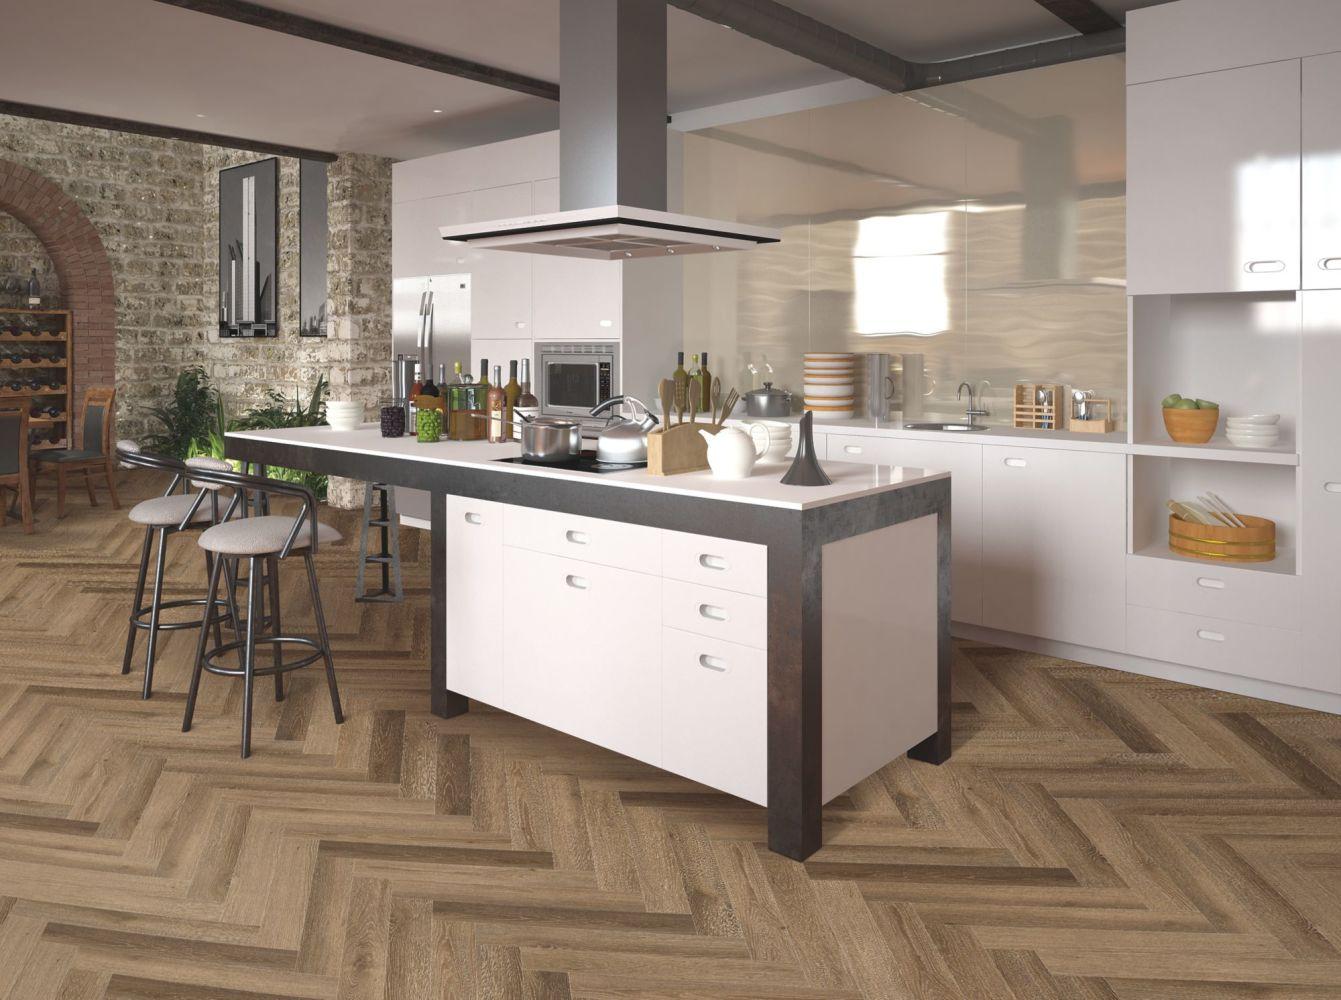 Shaw Floors Resilient Residential Chevron Ellijay Oak 04484_123CT